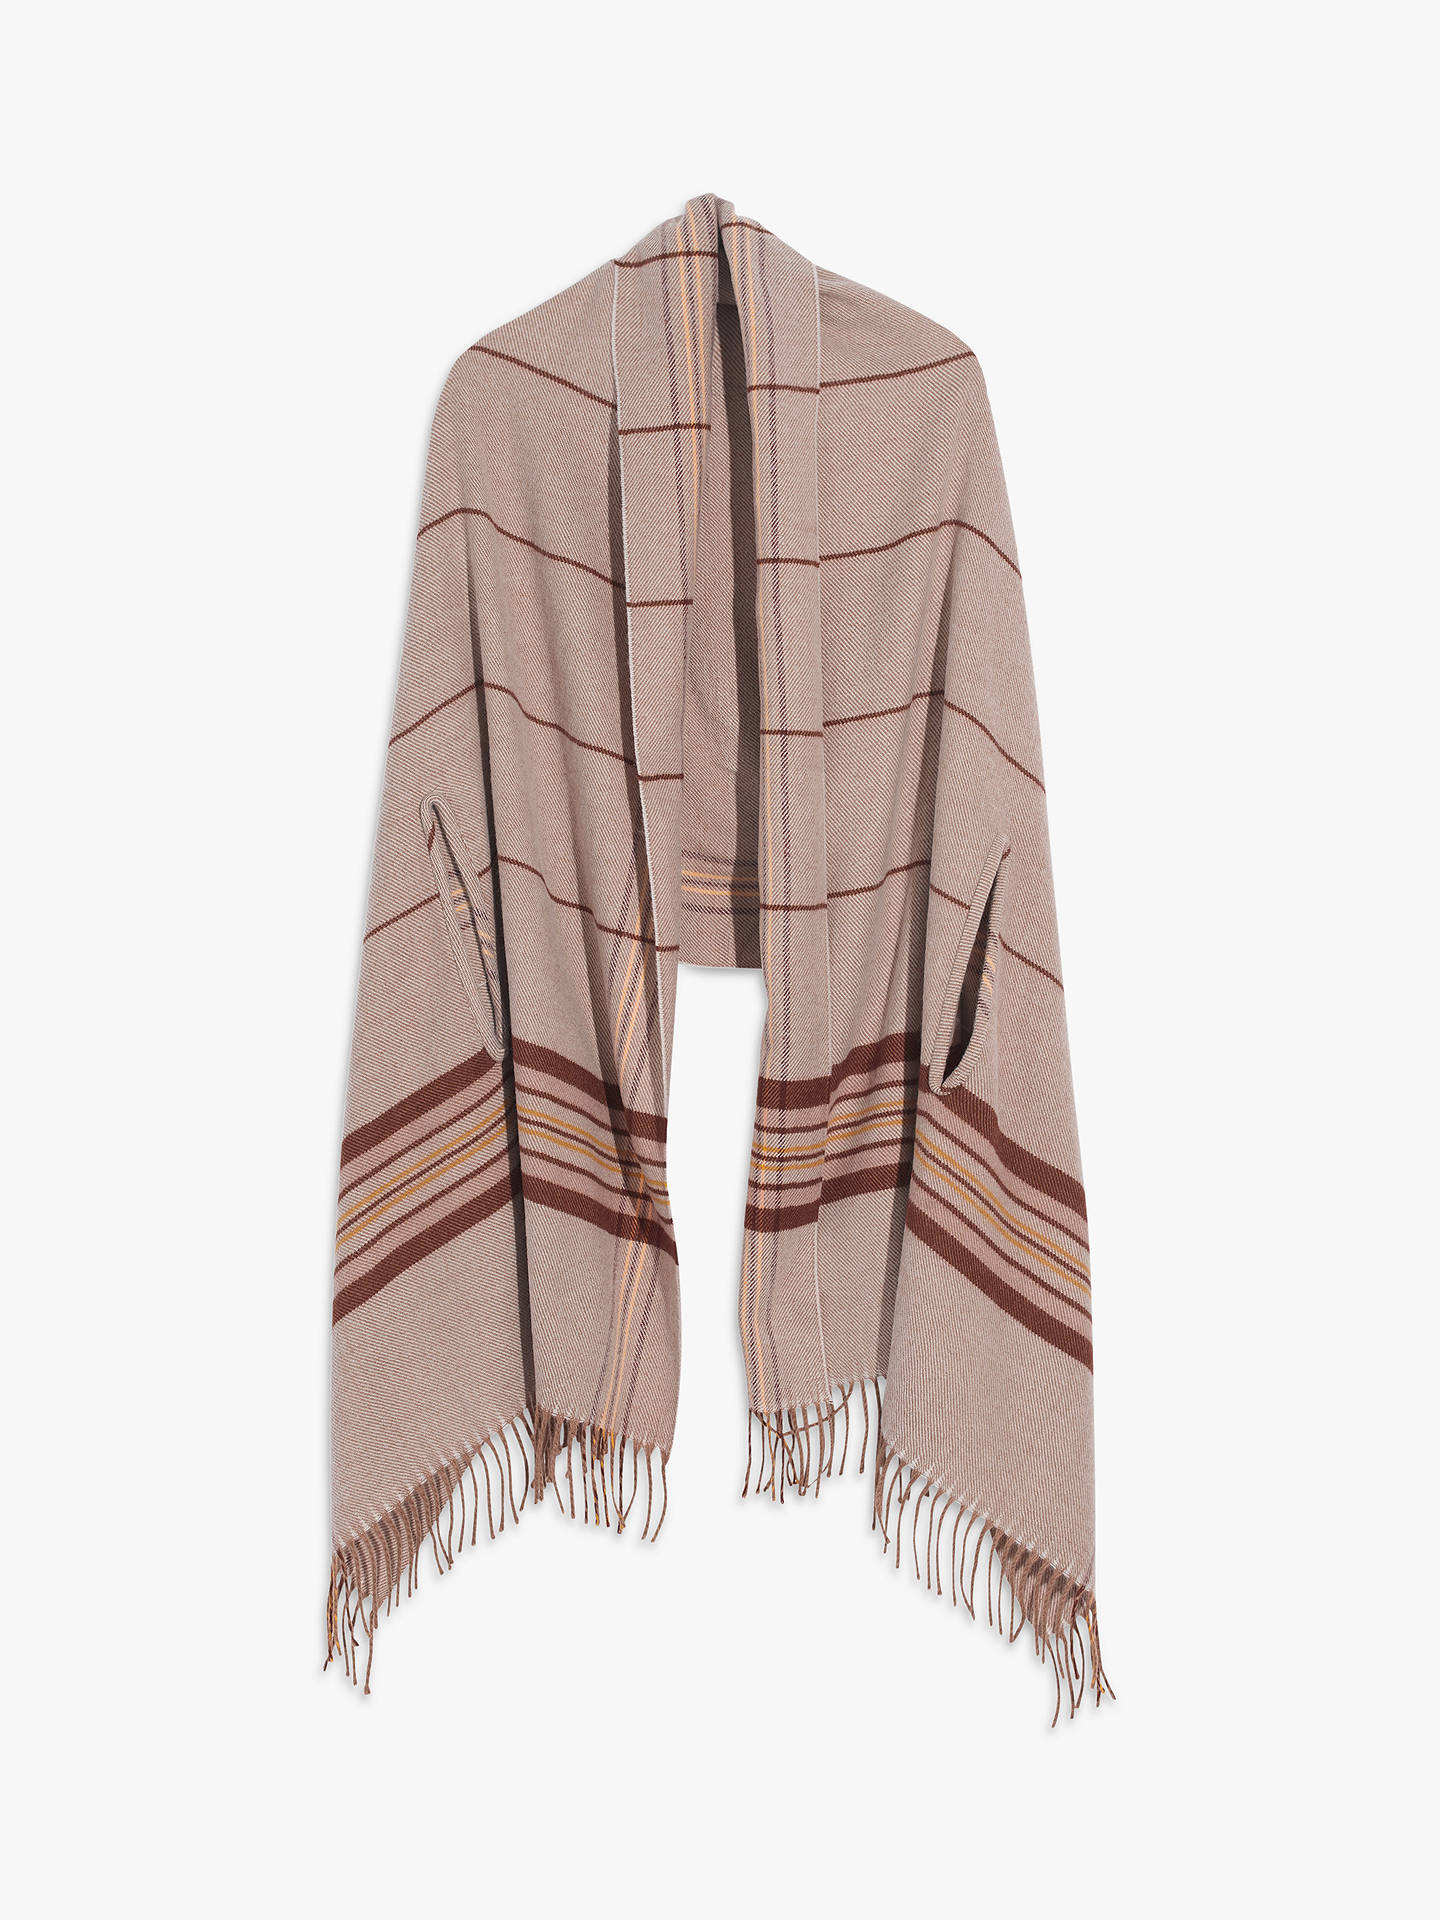 Madewell Placed Plaid Stripe Cape, Dark Camel/Multi